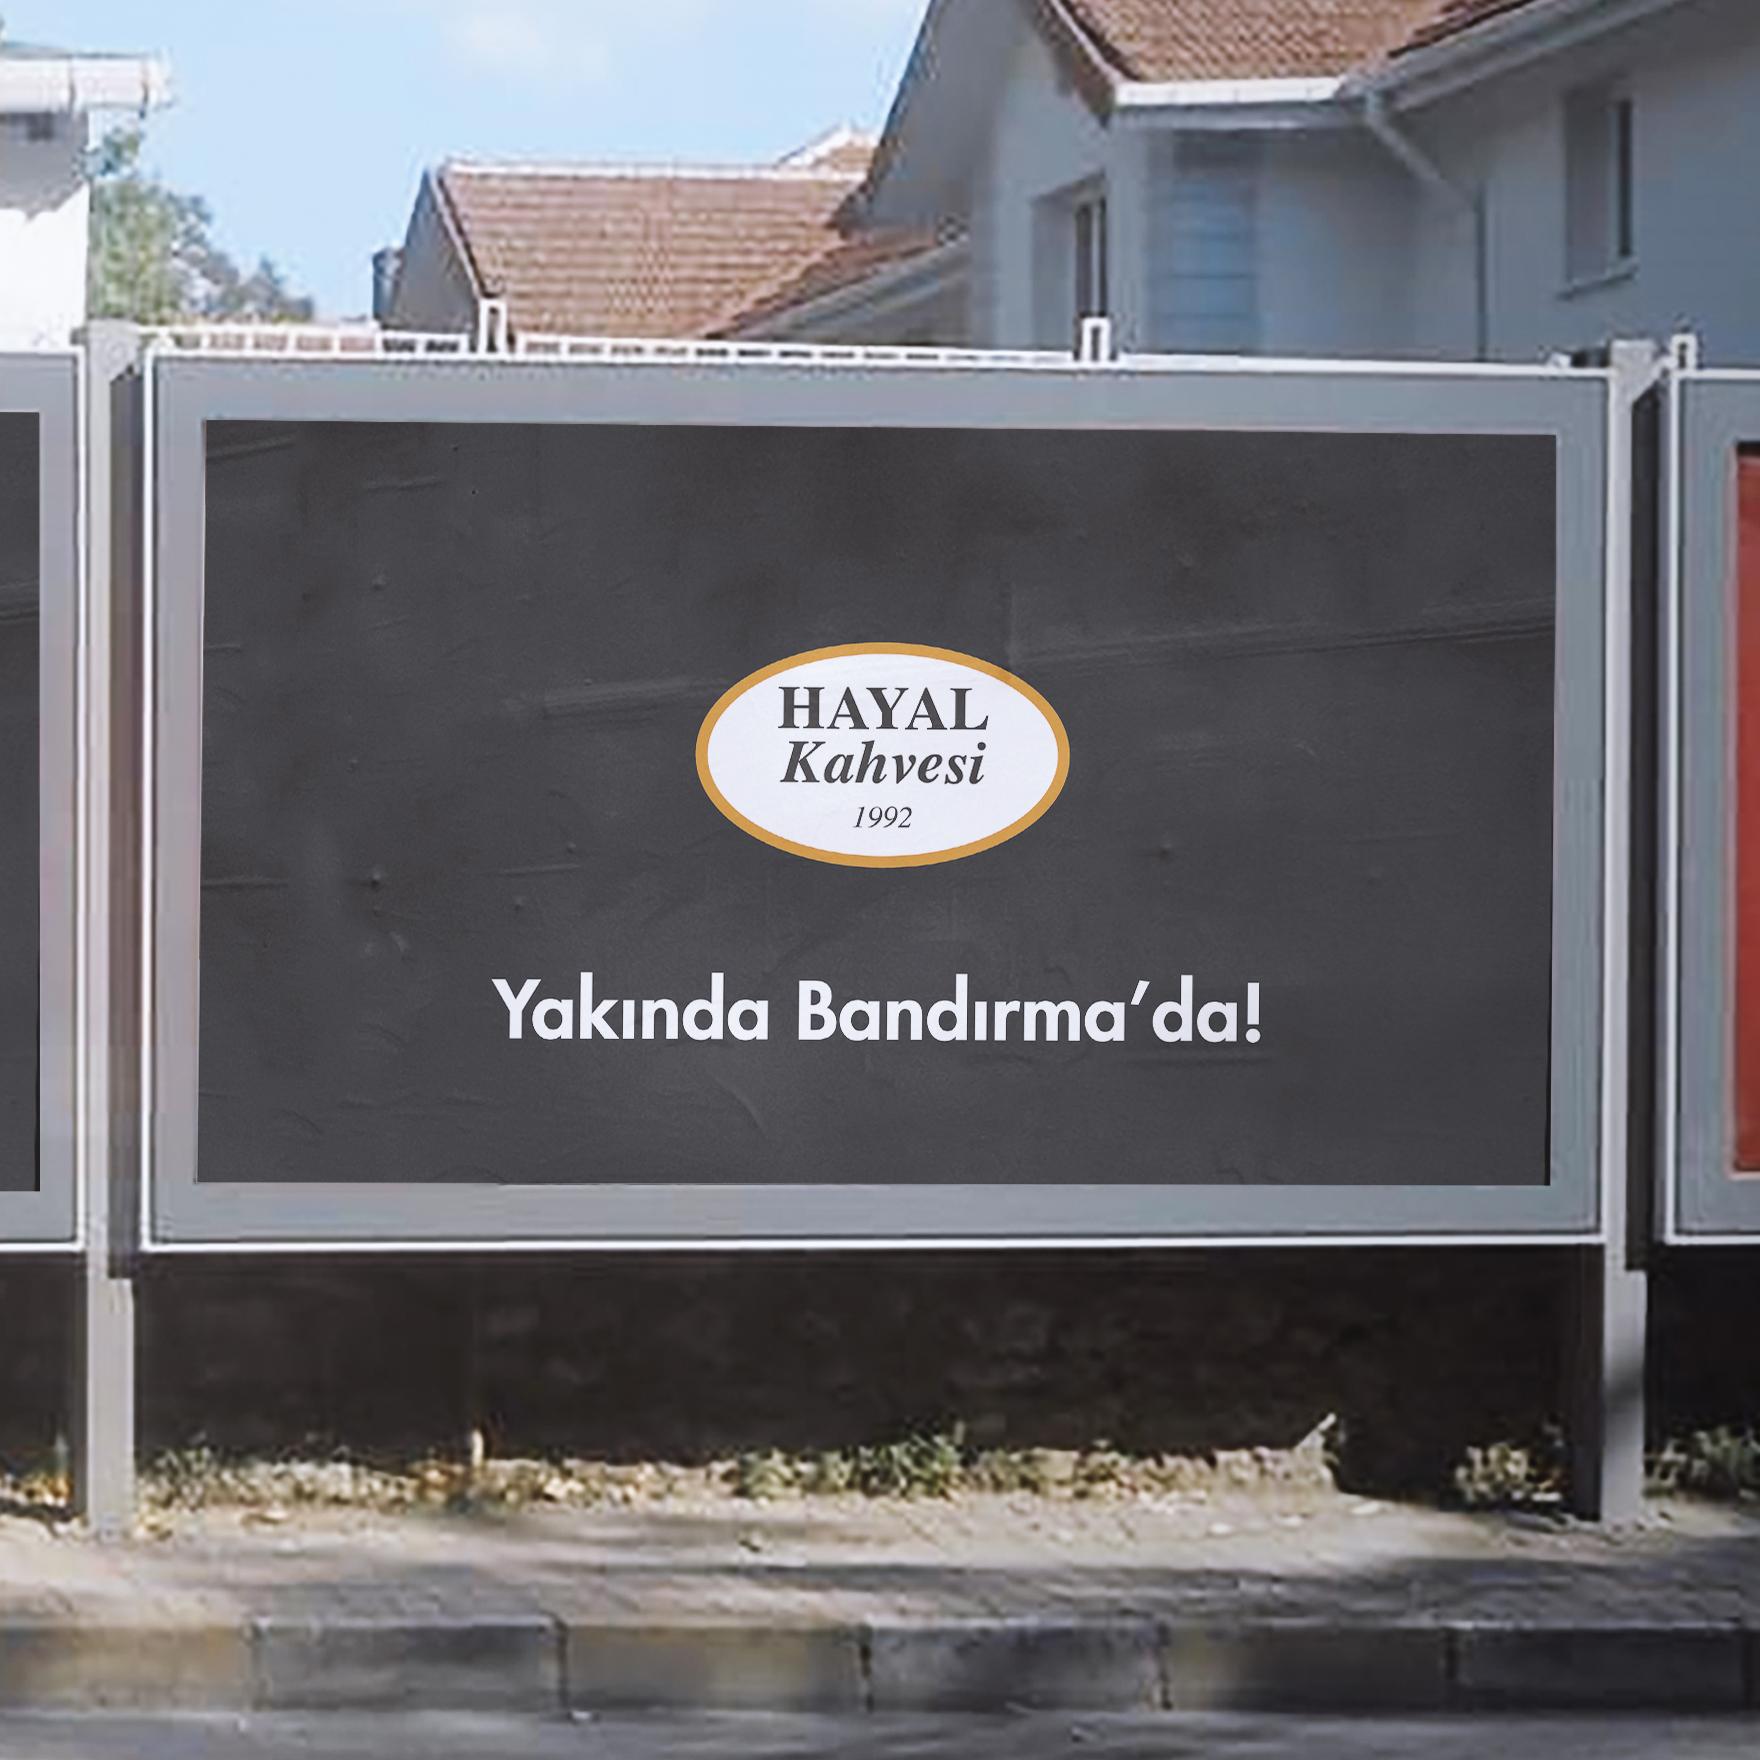 Hayal Kahvesi Billboard